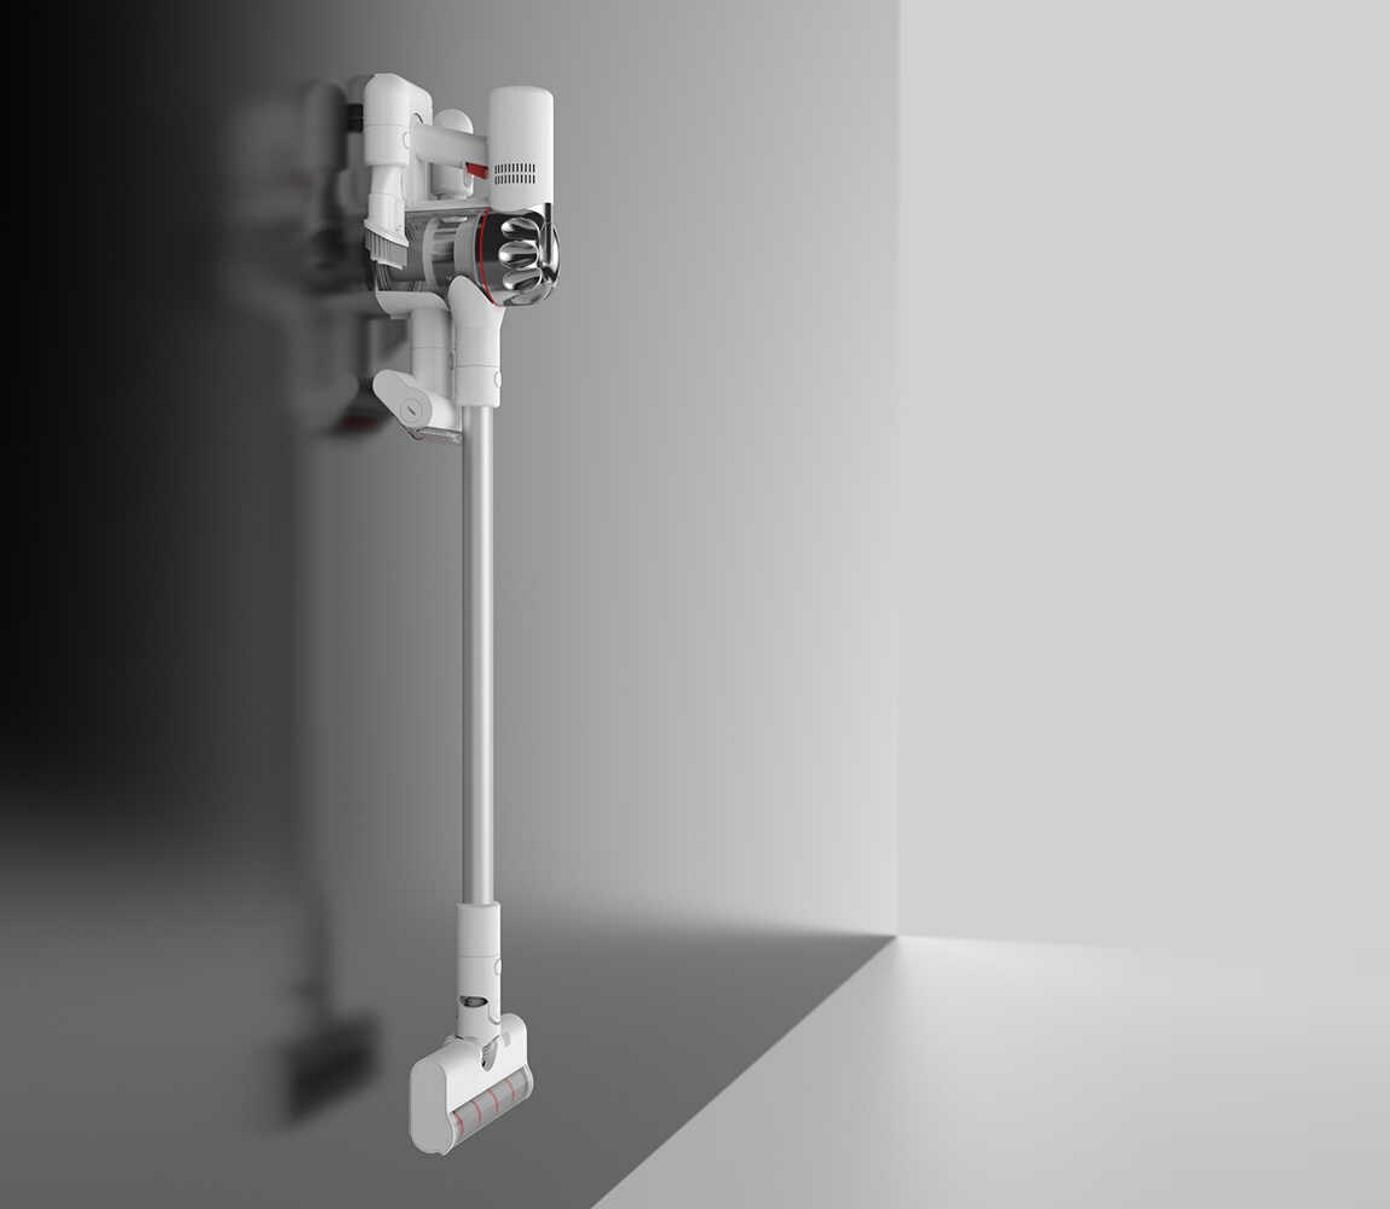 Opisanie Besprovodnoj Ruchnoj Pylesos Xiaomi Dreame V9p Wireless Vacuum Cleaner 4